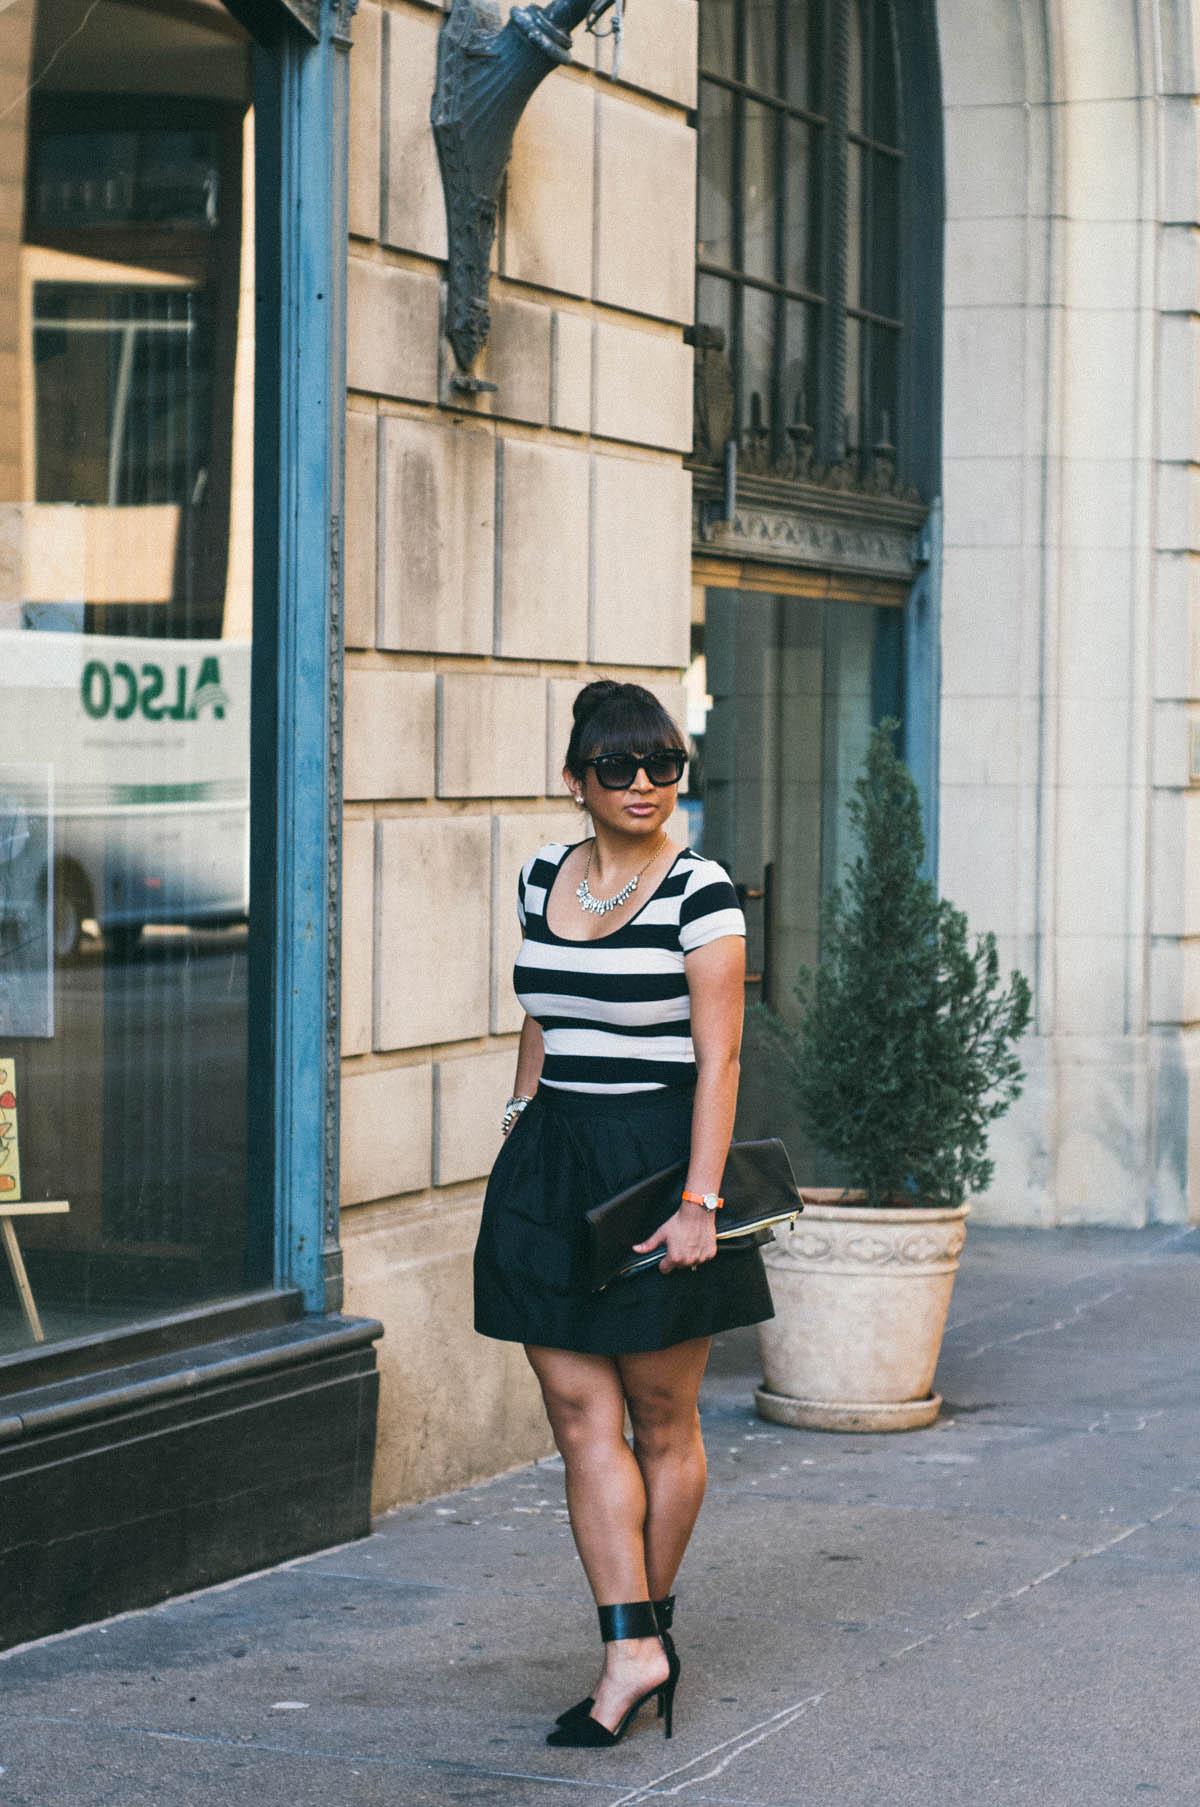 Dress: H&M | Skirt: J.Crew | Shoes: Zara | Clutch: American Apparel | Sunglasses: Tom Ford | Watch: Timex for J.Crew | Jewelry: Cara, Stella & Dot